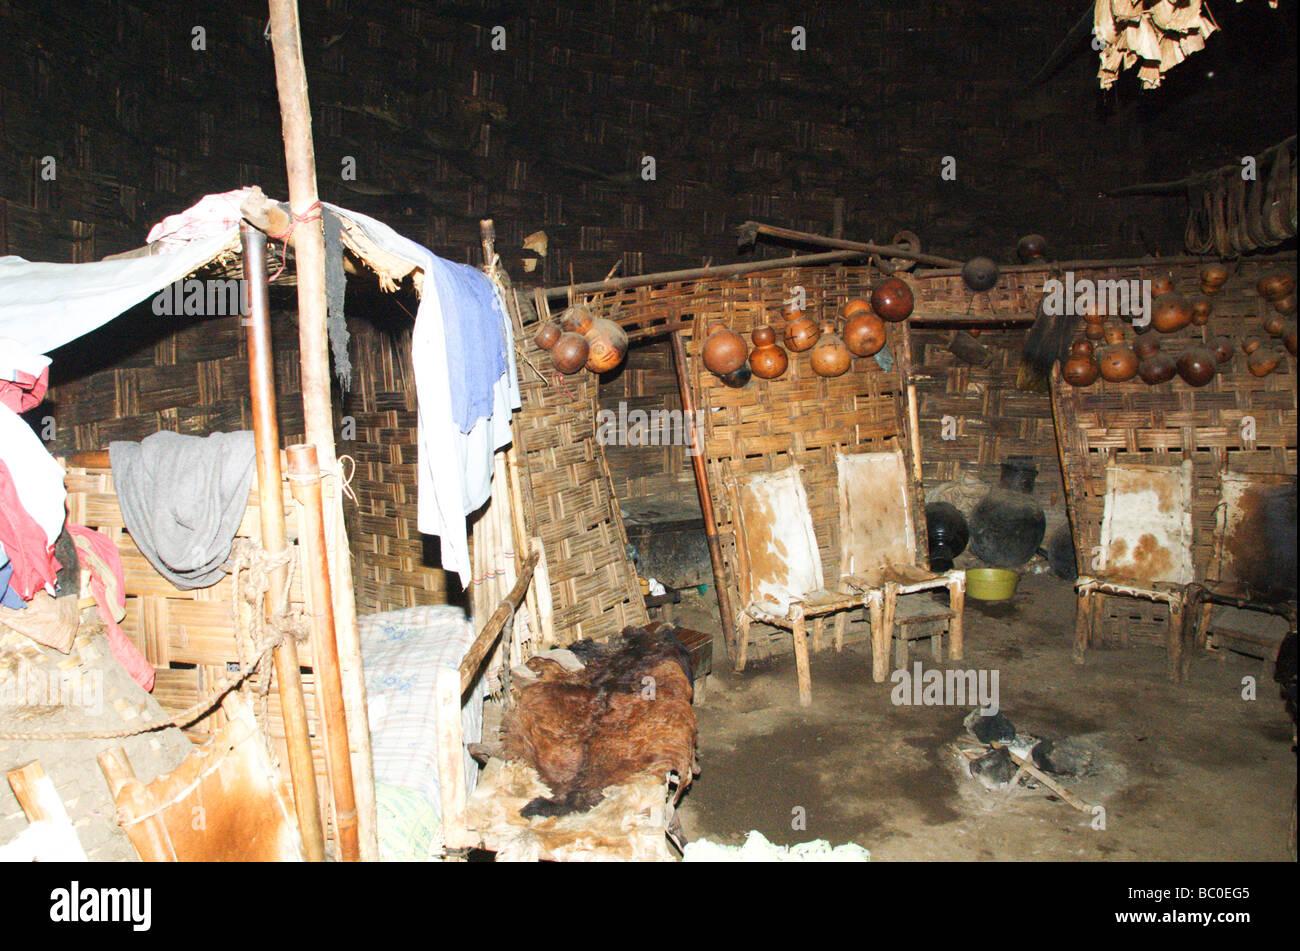 Africa Ethiopia Omo region Chencha Dorze village interior of a traditional elephant shaped hut - Stock Image